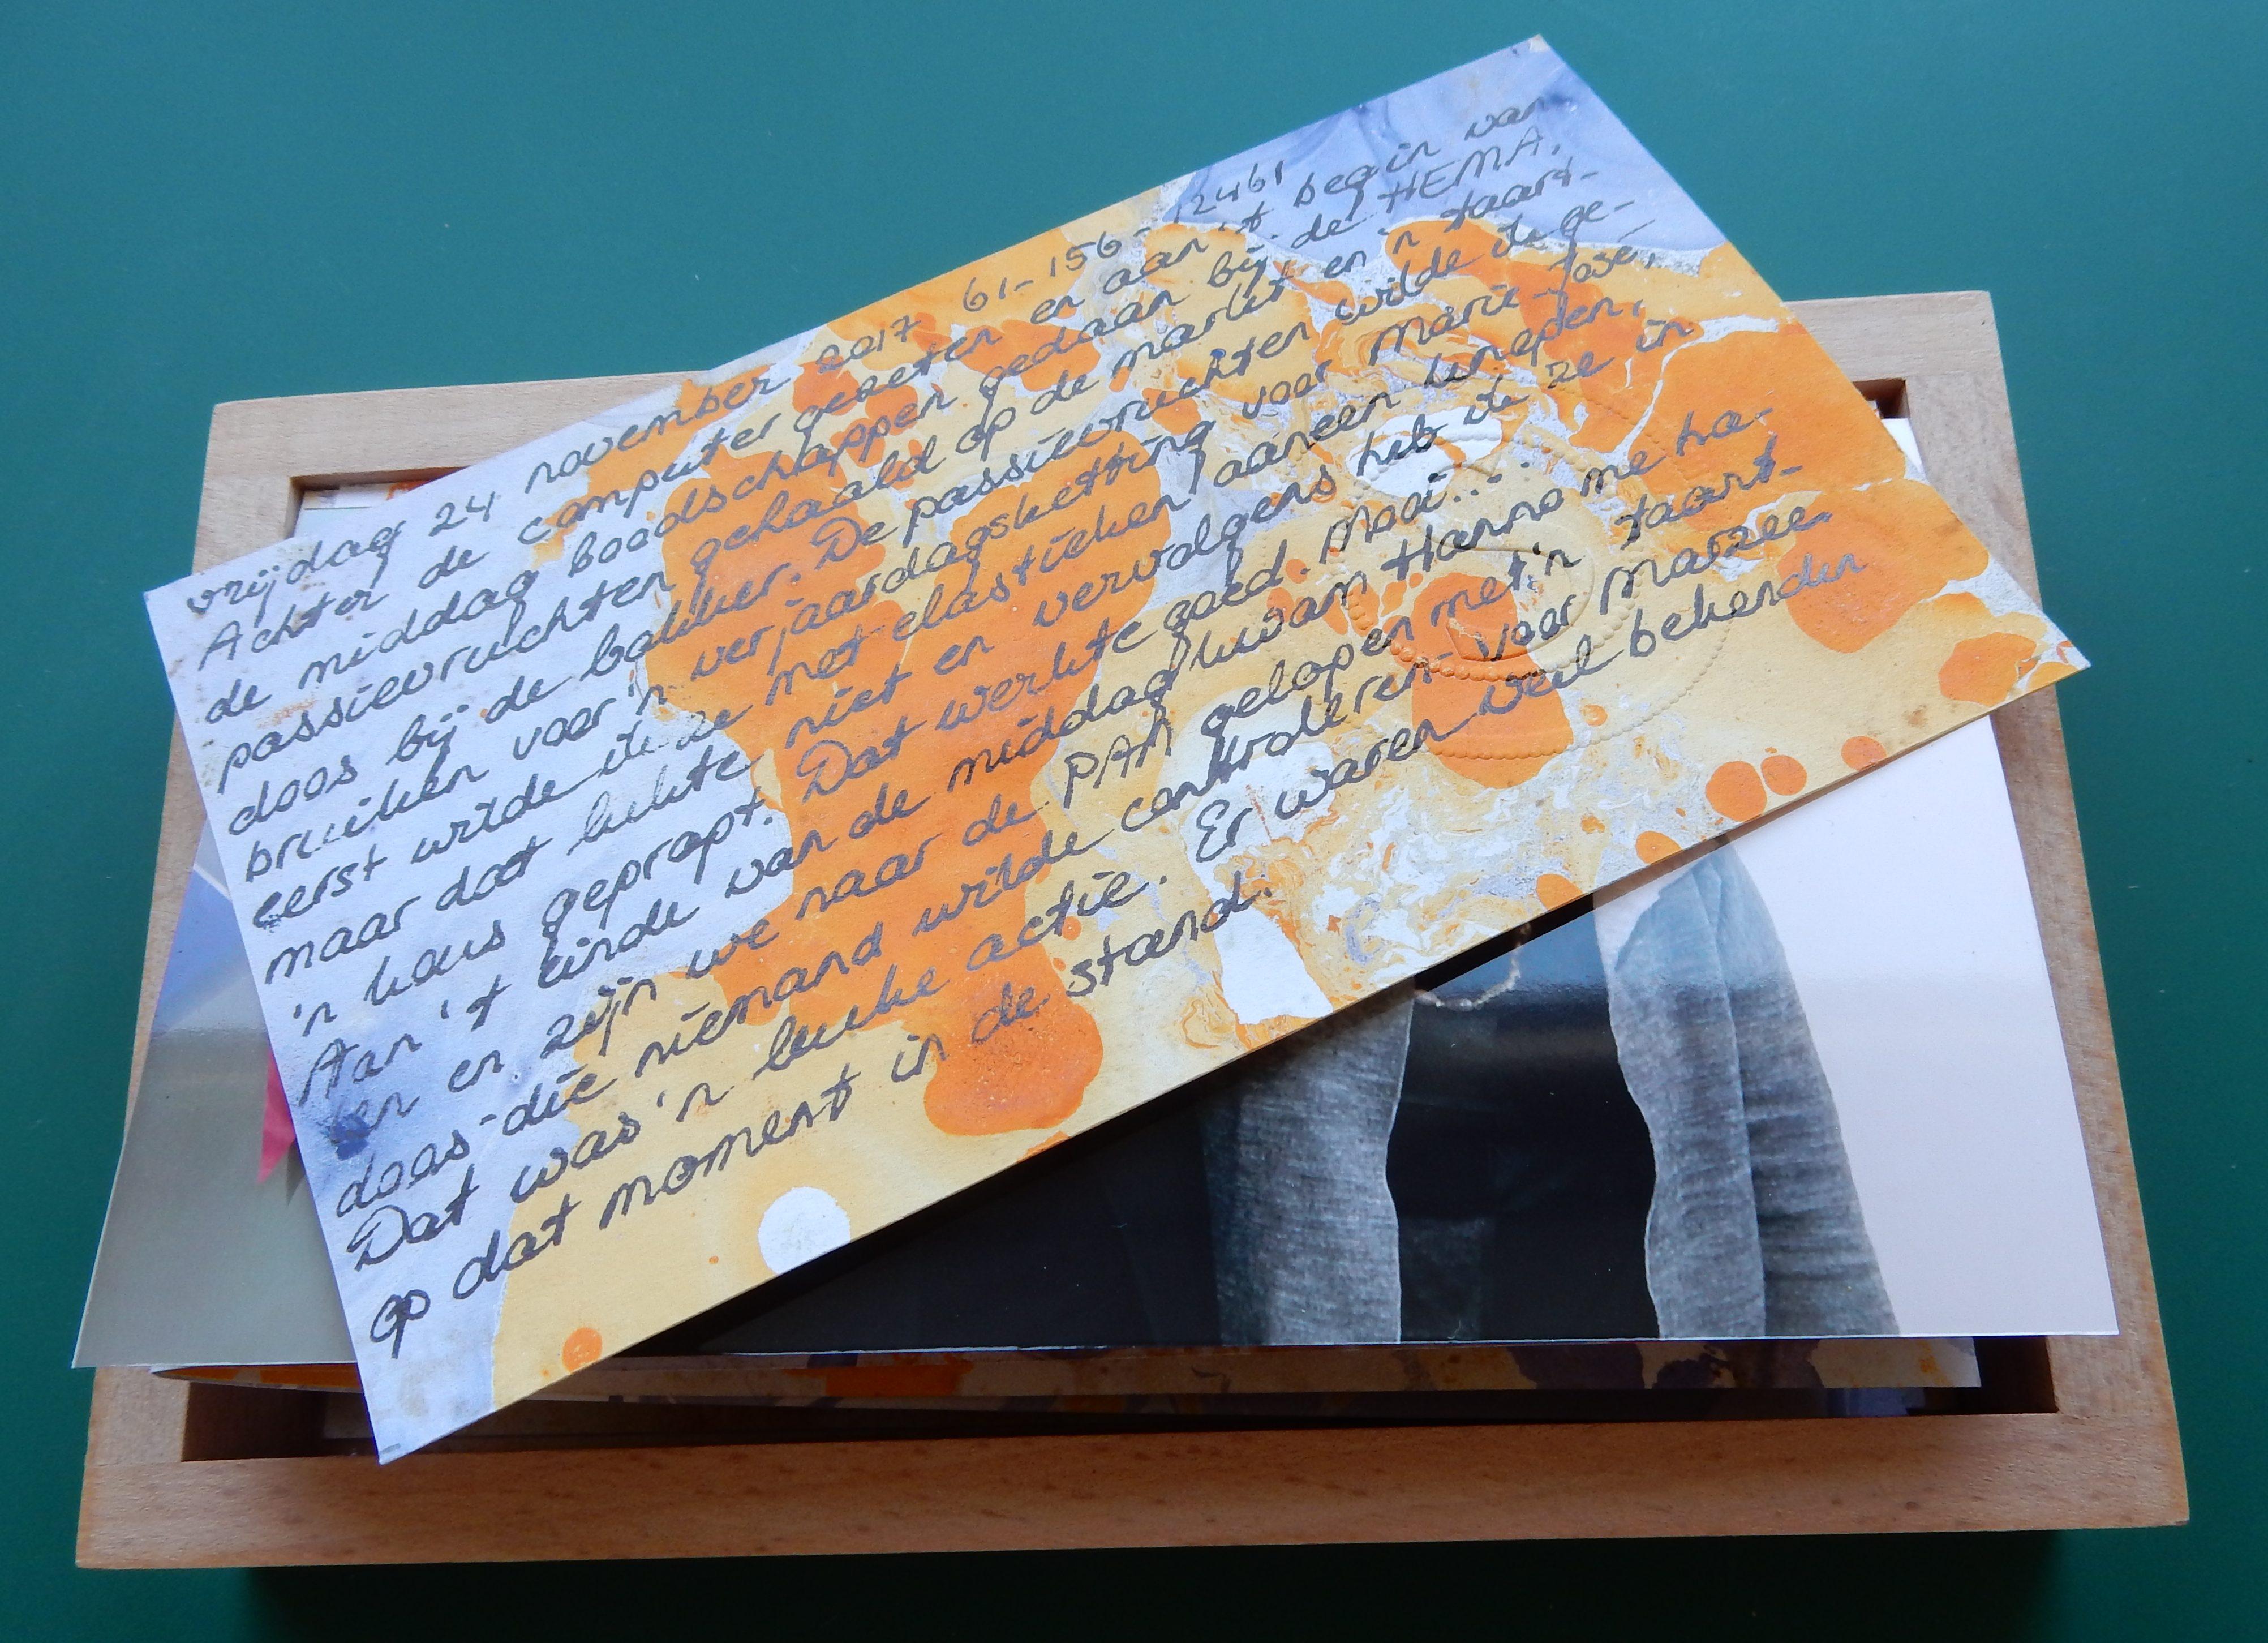 Esther Doornbusch, Dagboekfragment op gemarmerd papier, 2019. Cadeausje voor Marzee, mei 2019. Foto Esther Doornbusch, CC BY 4.0